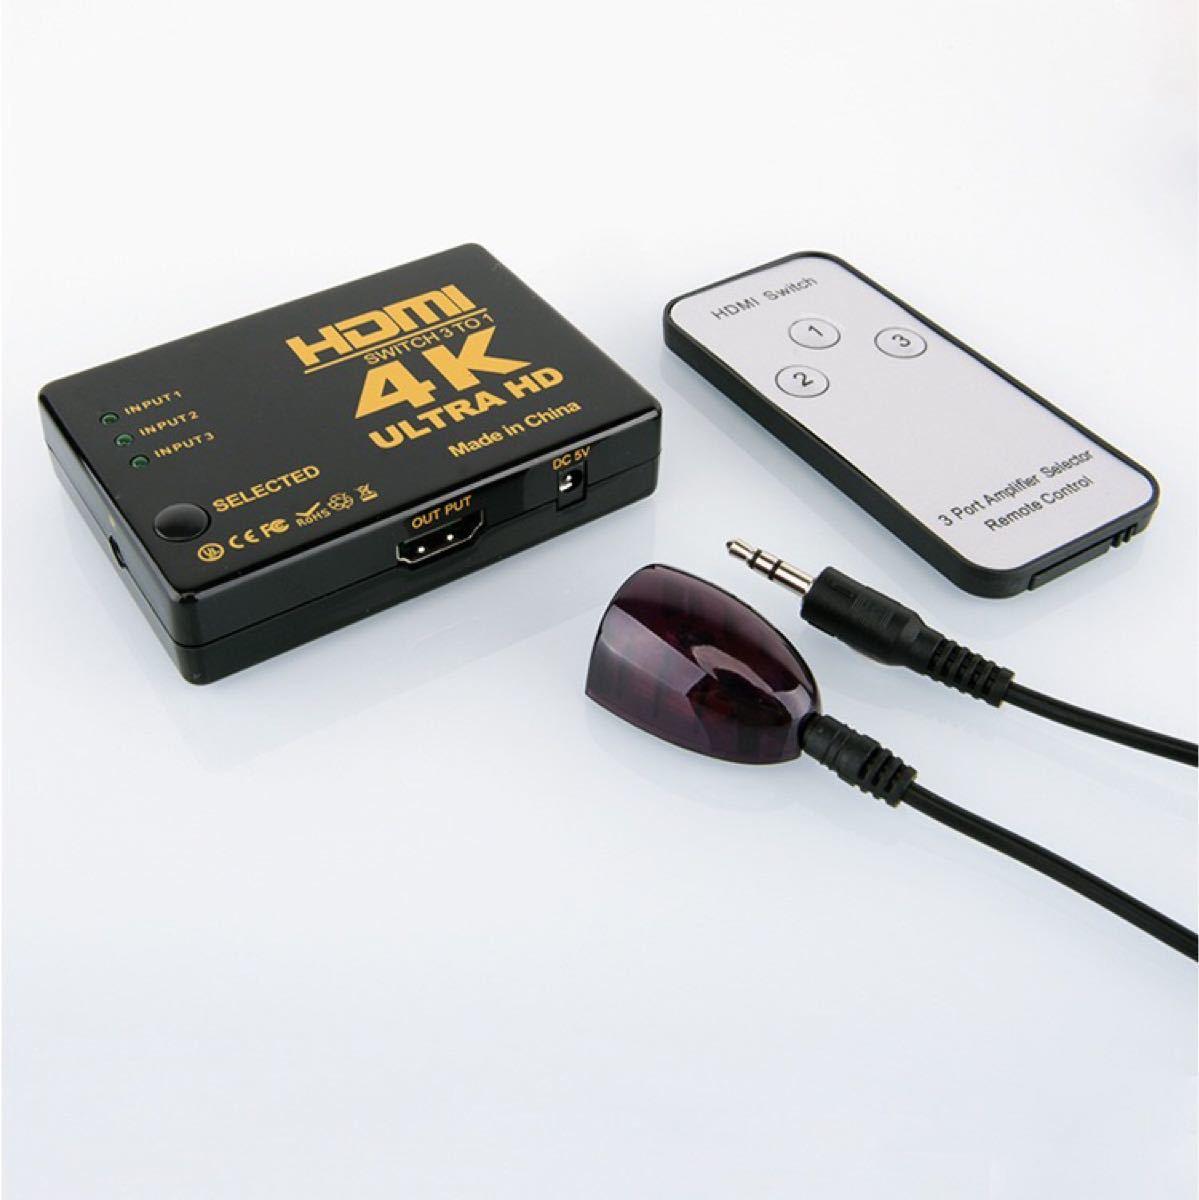 HDMI分配器 切替器 セレクター 4K対応 3入力1出力 リモコン付き